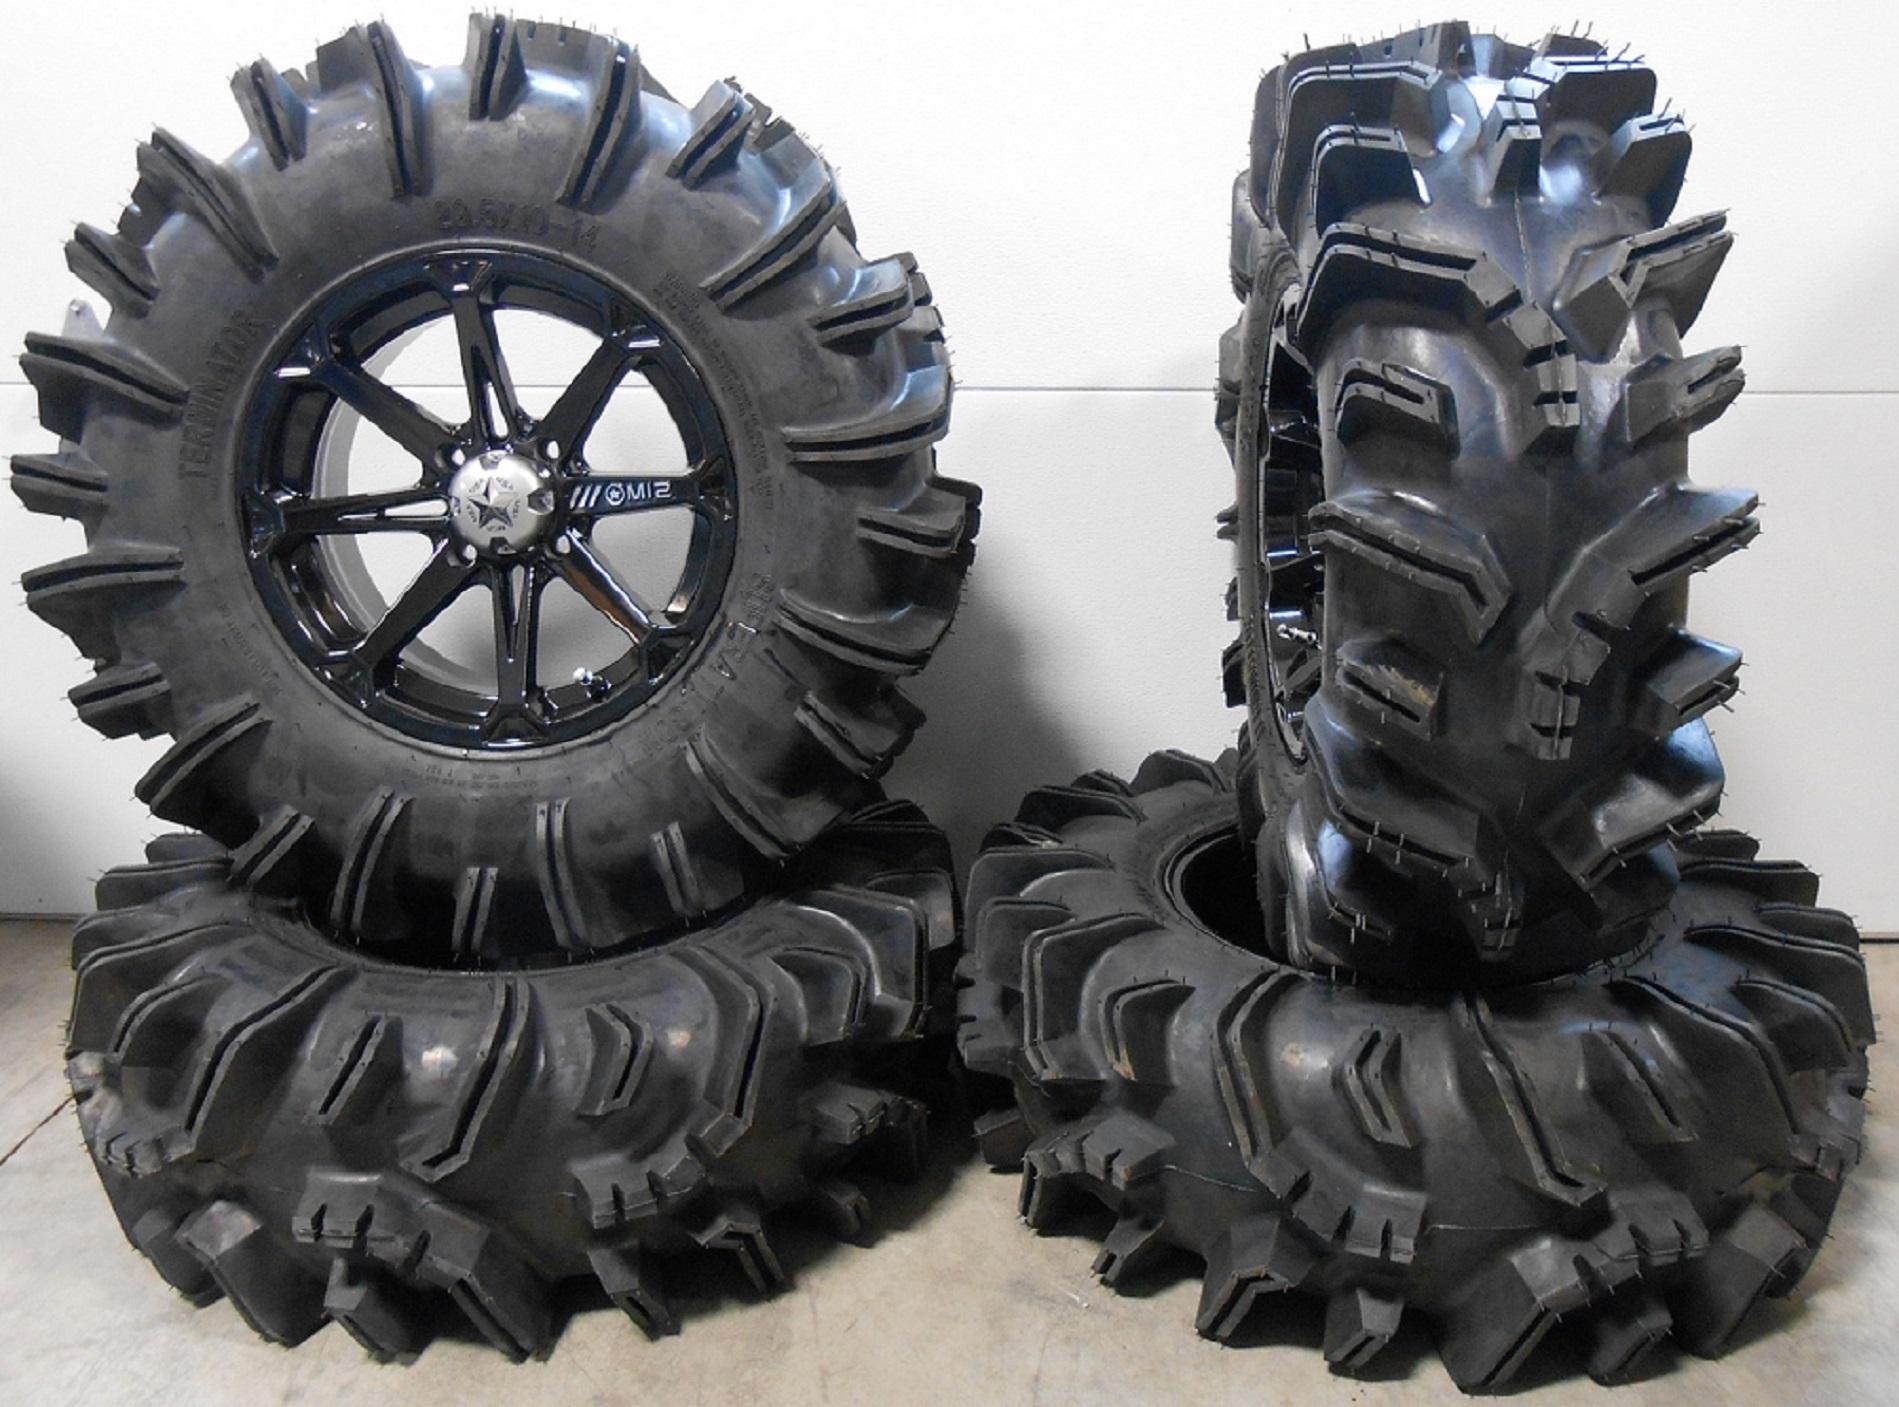 Msa Black Diesel 14 Utv Wheels 29 5 Terminator Tires Polaris Rzr 1000 Xp Ebay